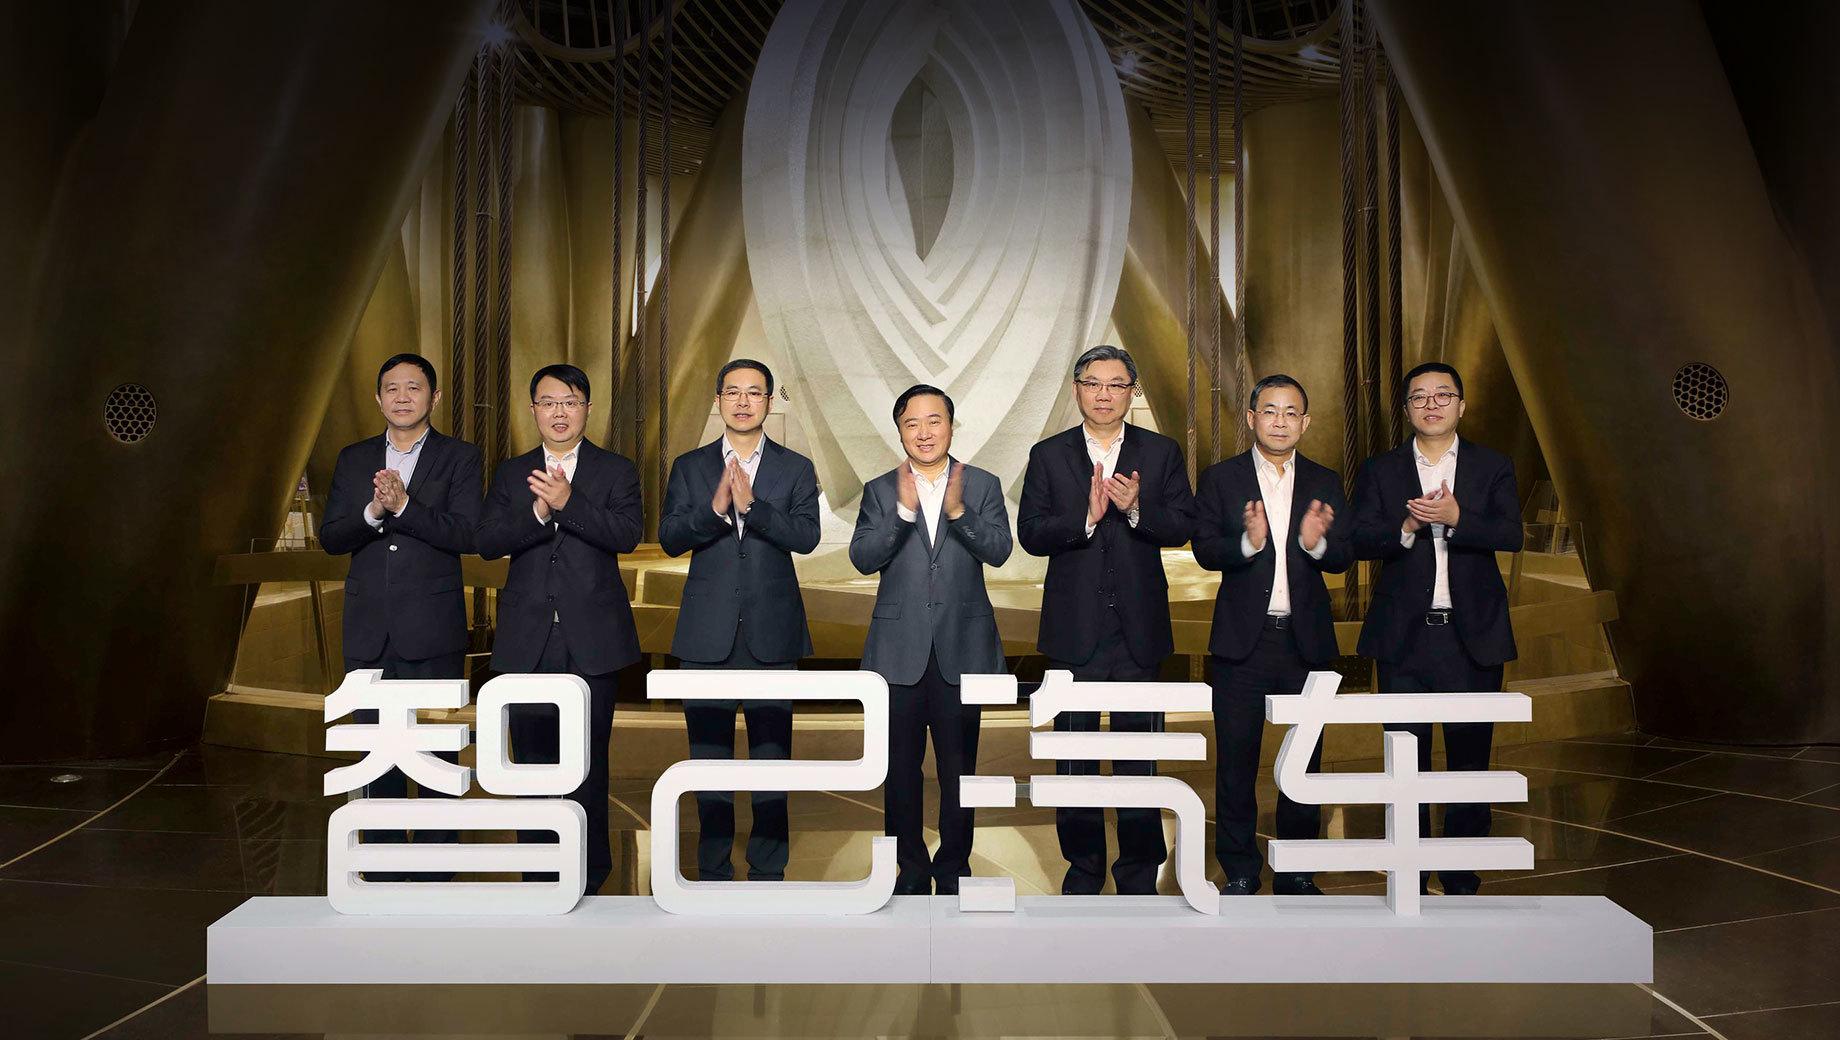 Концерн SAIC создал электрический бренд Zhiji Auto